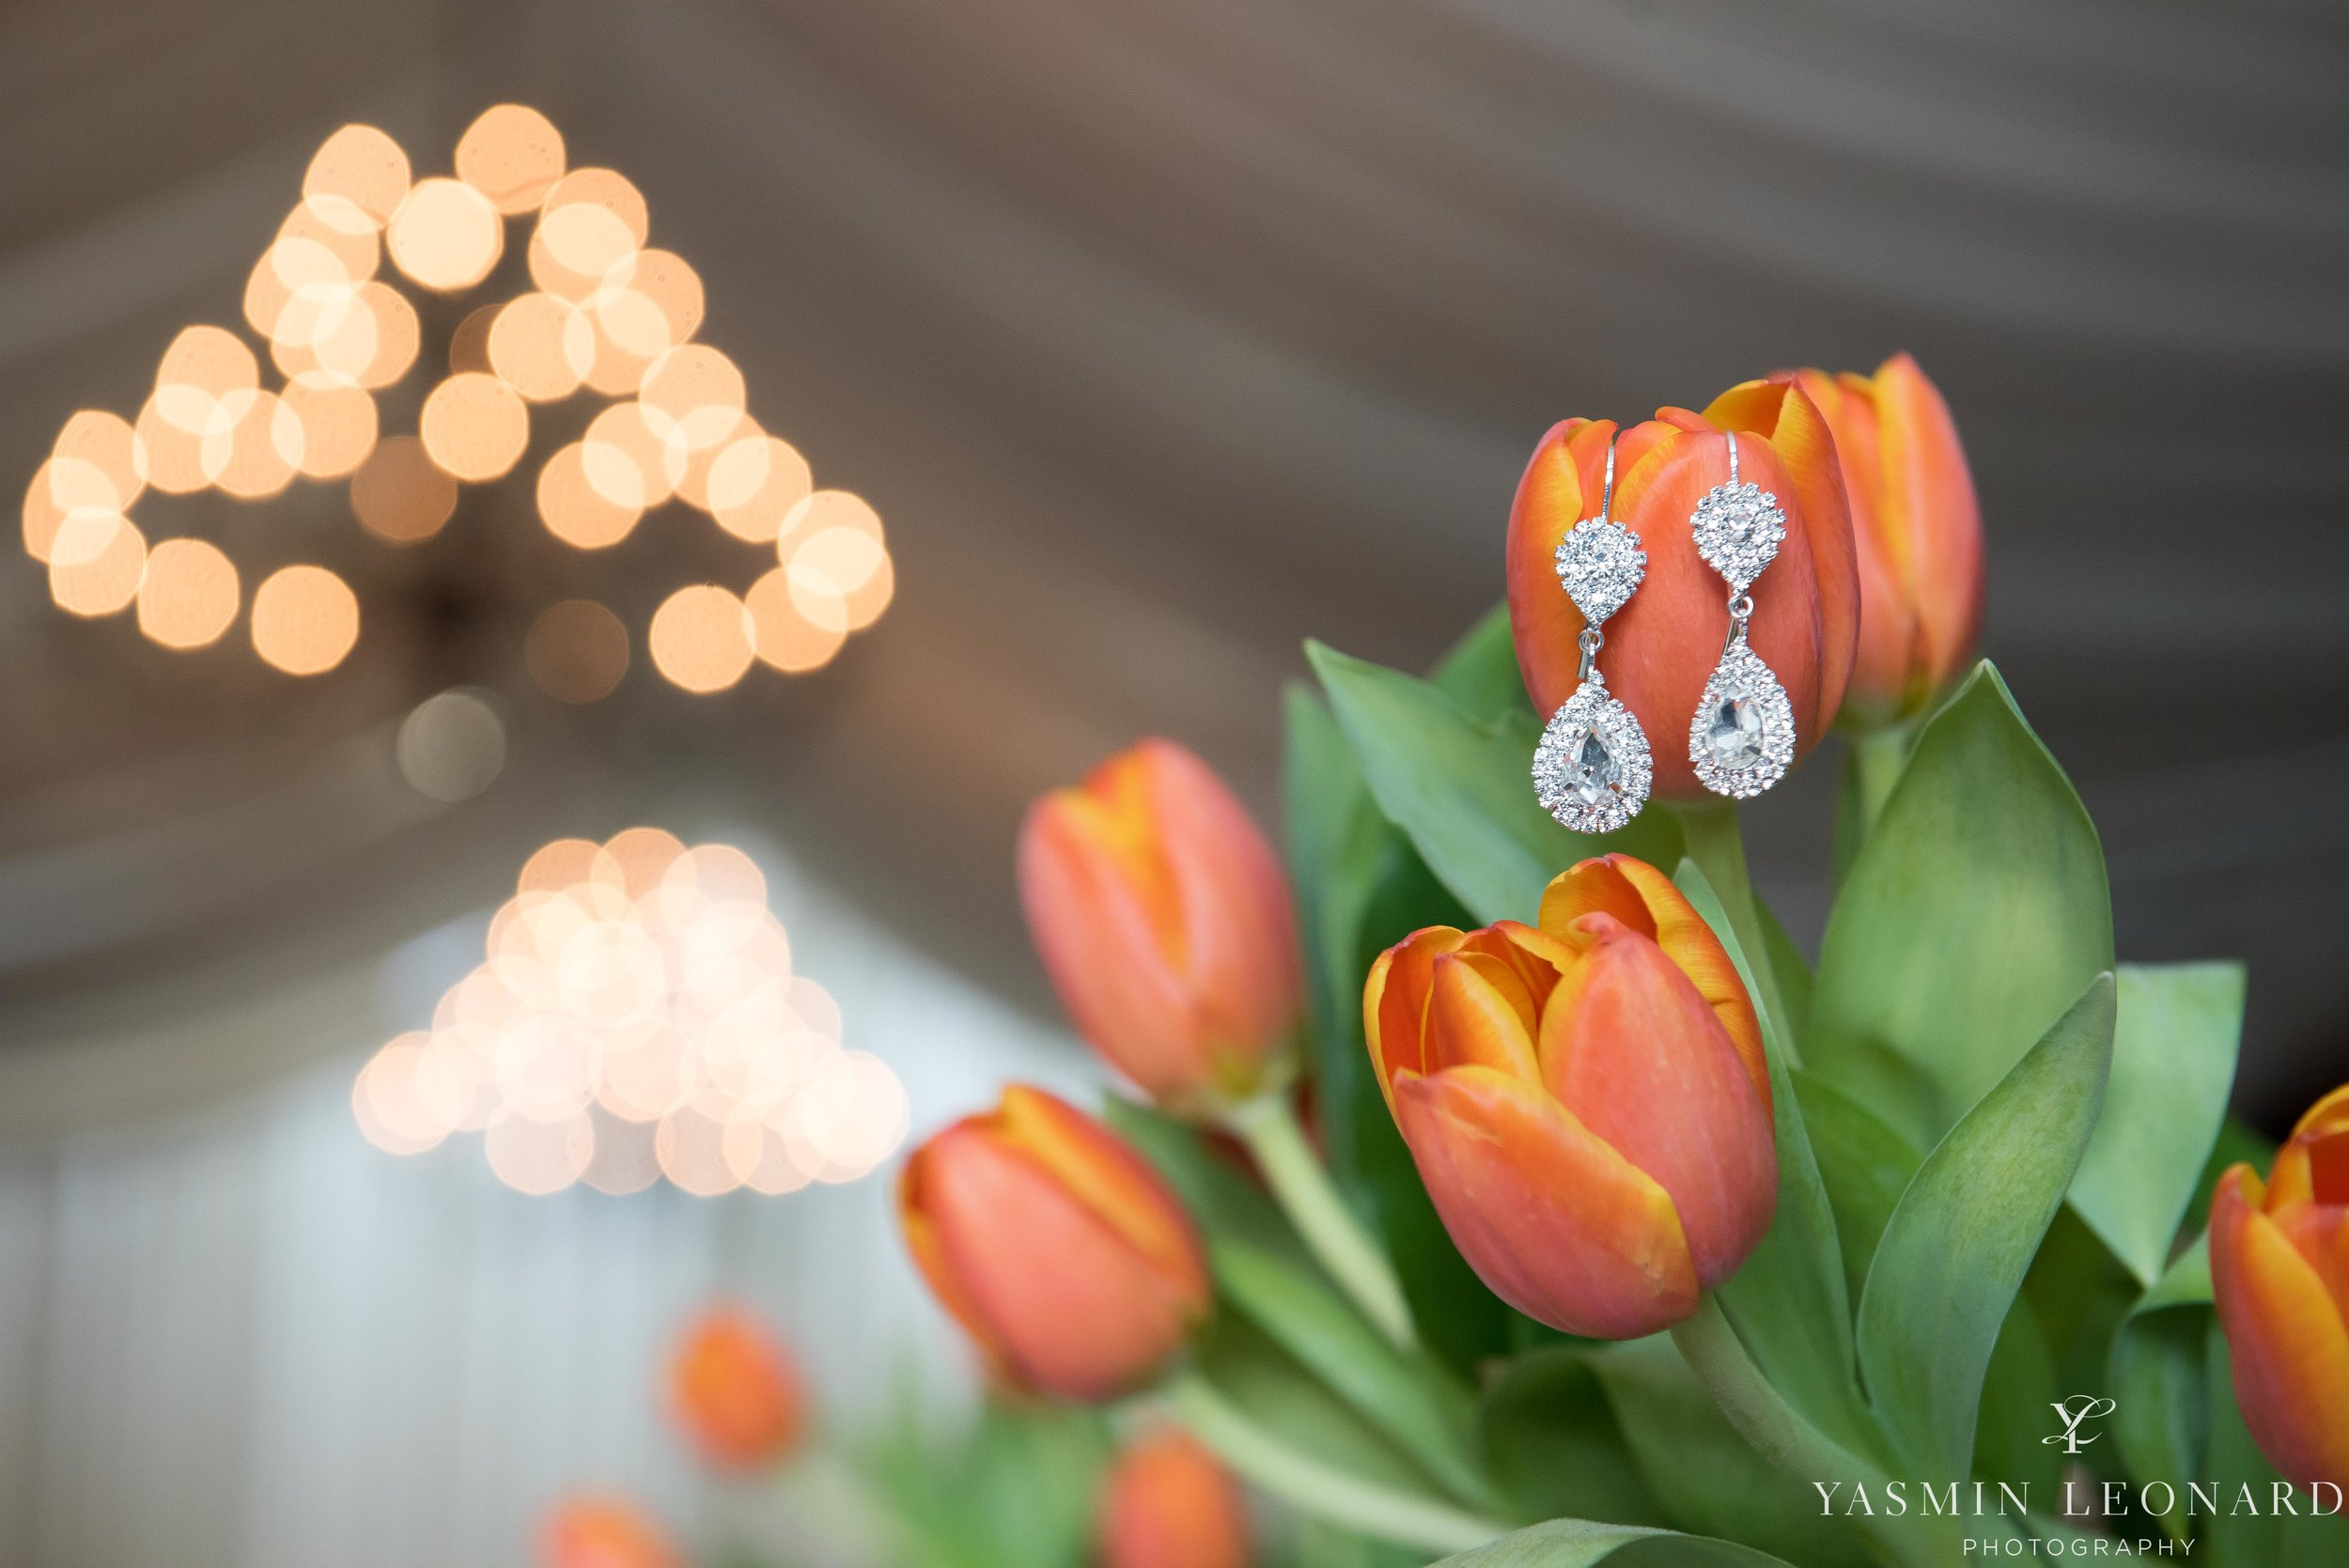 Adaumont Farm - Adaumont Farm Weddings - Trinity Weddings - NC Weddings - Yasmin Leonard Photography-8.jpg